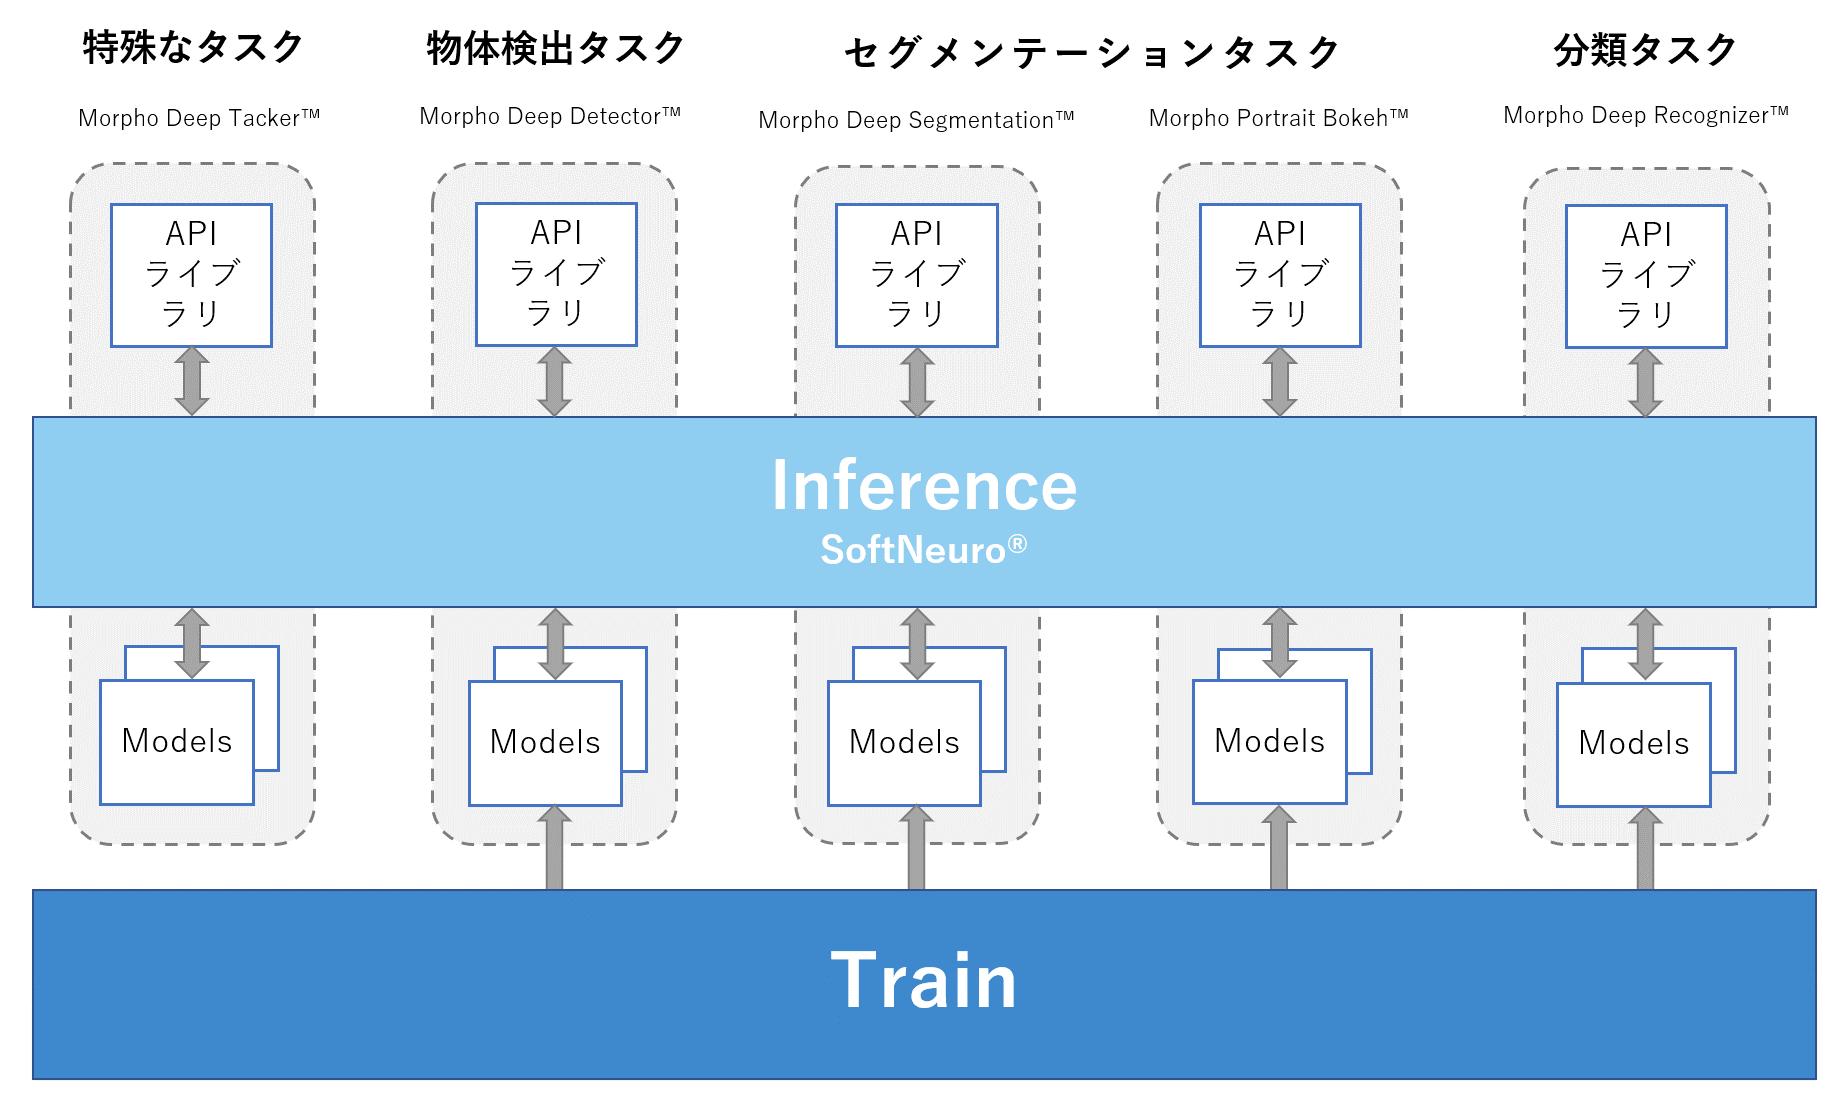 https://www.morphoinc.com/zwj675qzb/wp-content/uploads/2020/10/Relations-Among-AI-Products_JP.png